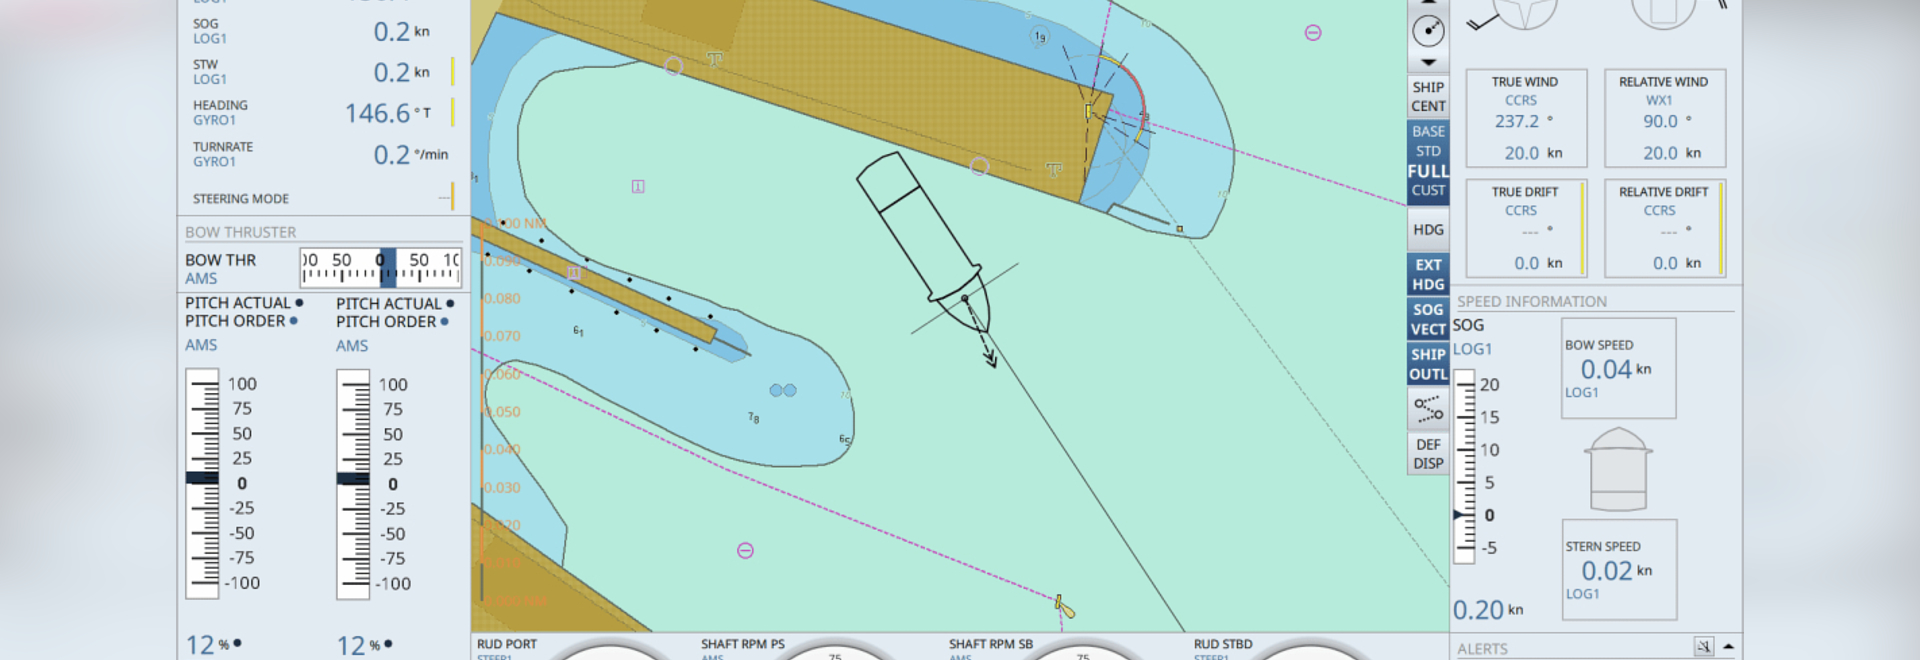 Marine Electronics: New Display Aims to Simplify Ship Docking